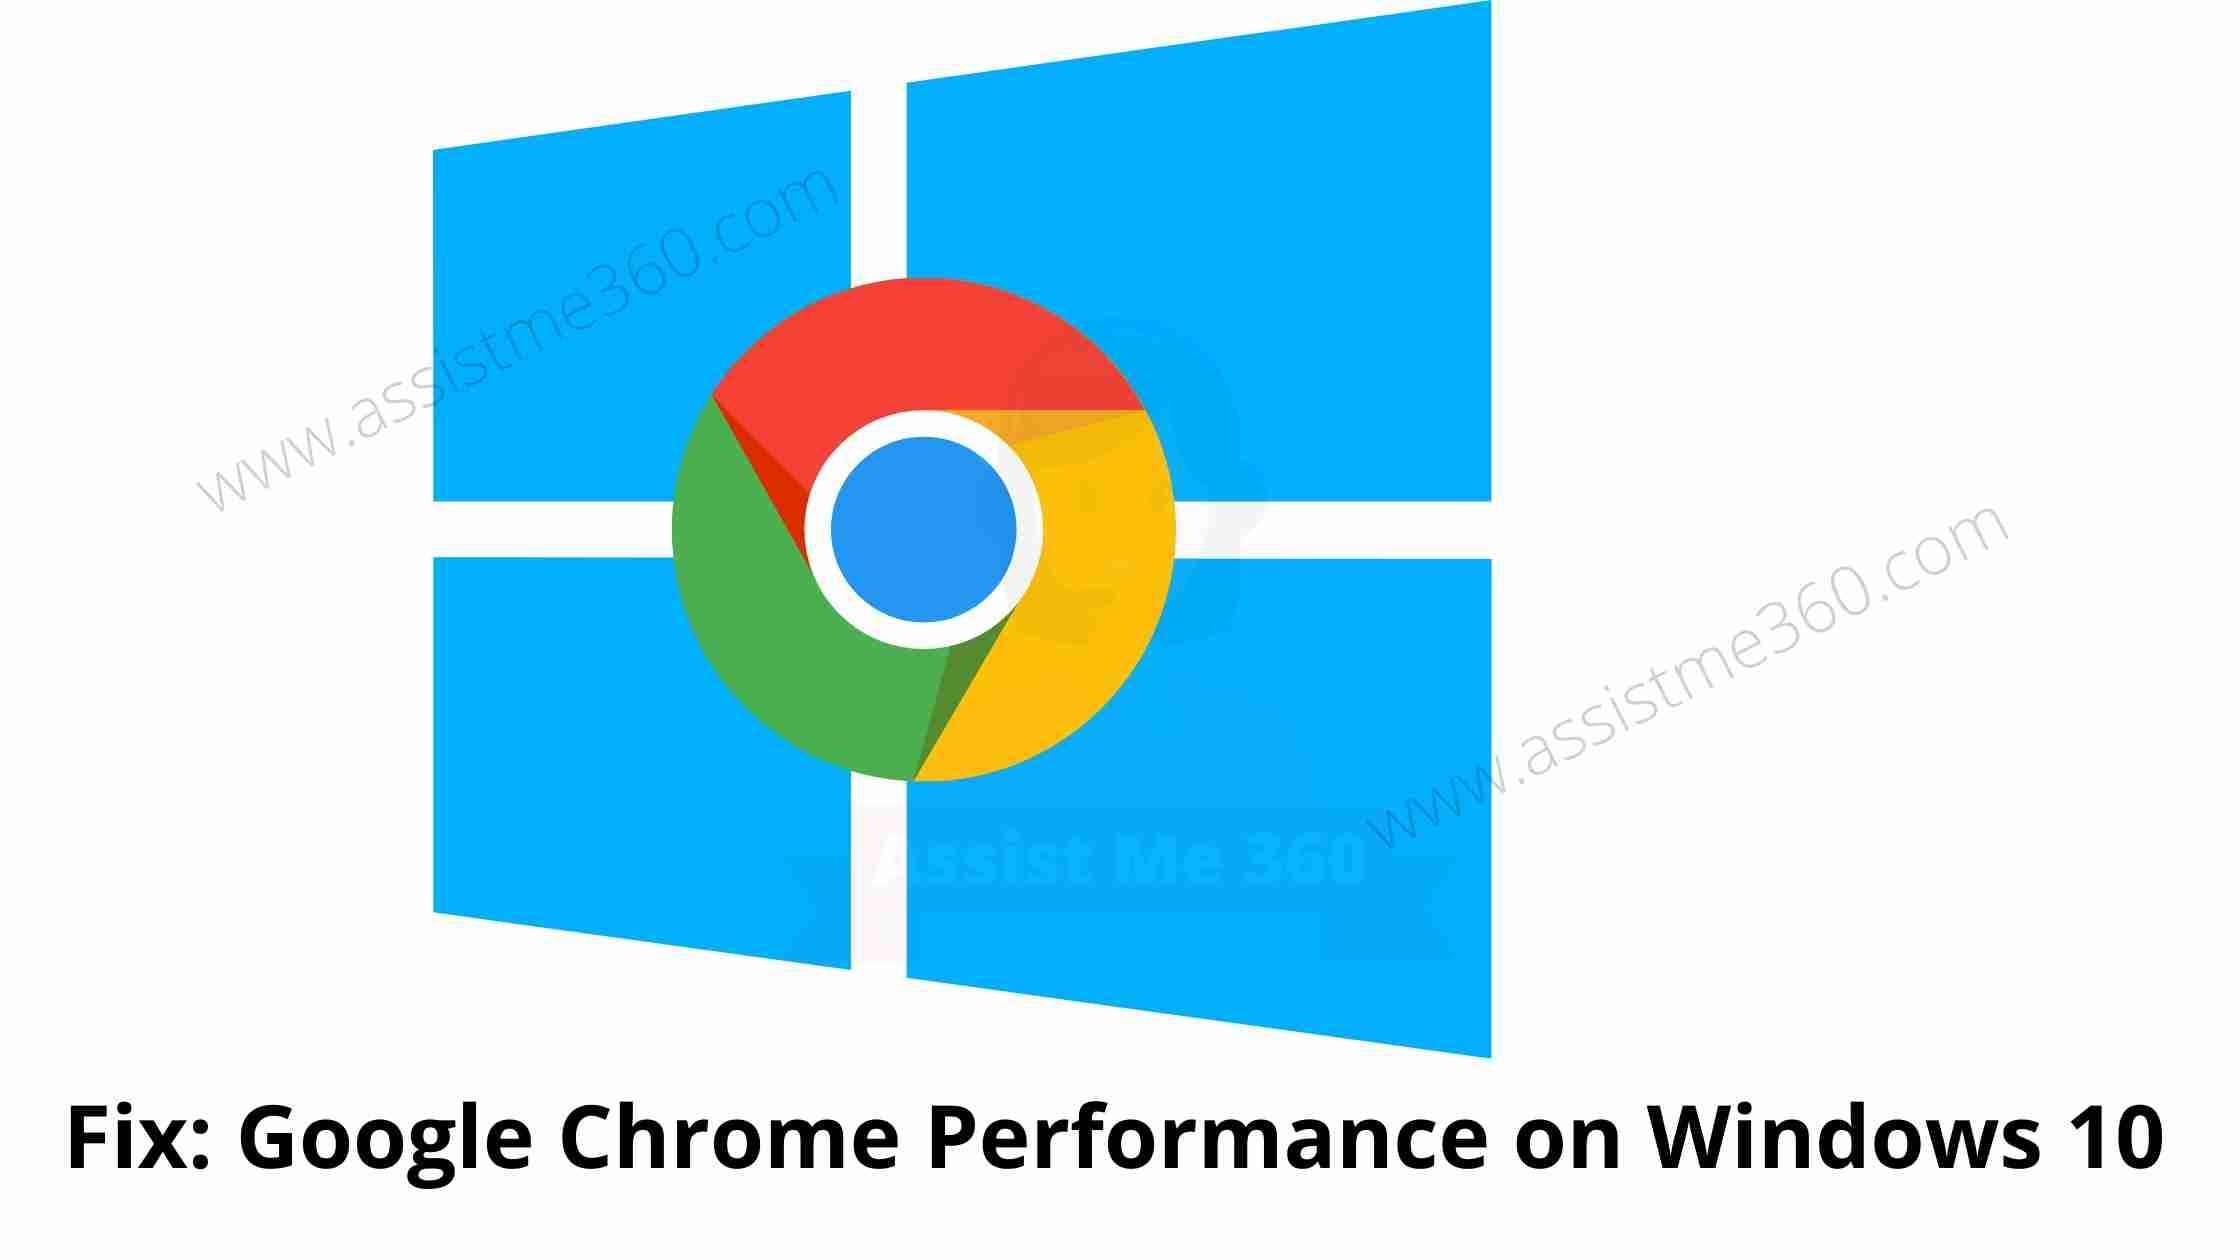 Chrome Slow on Windows